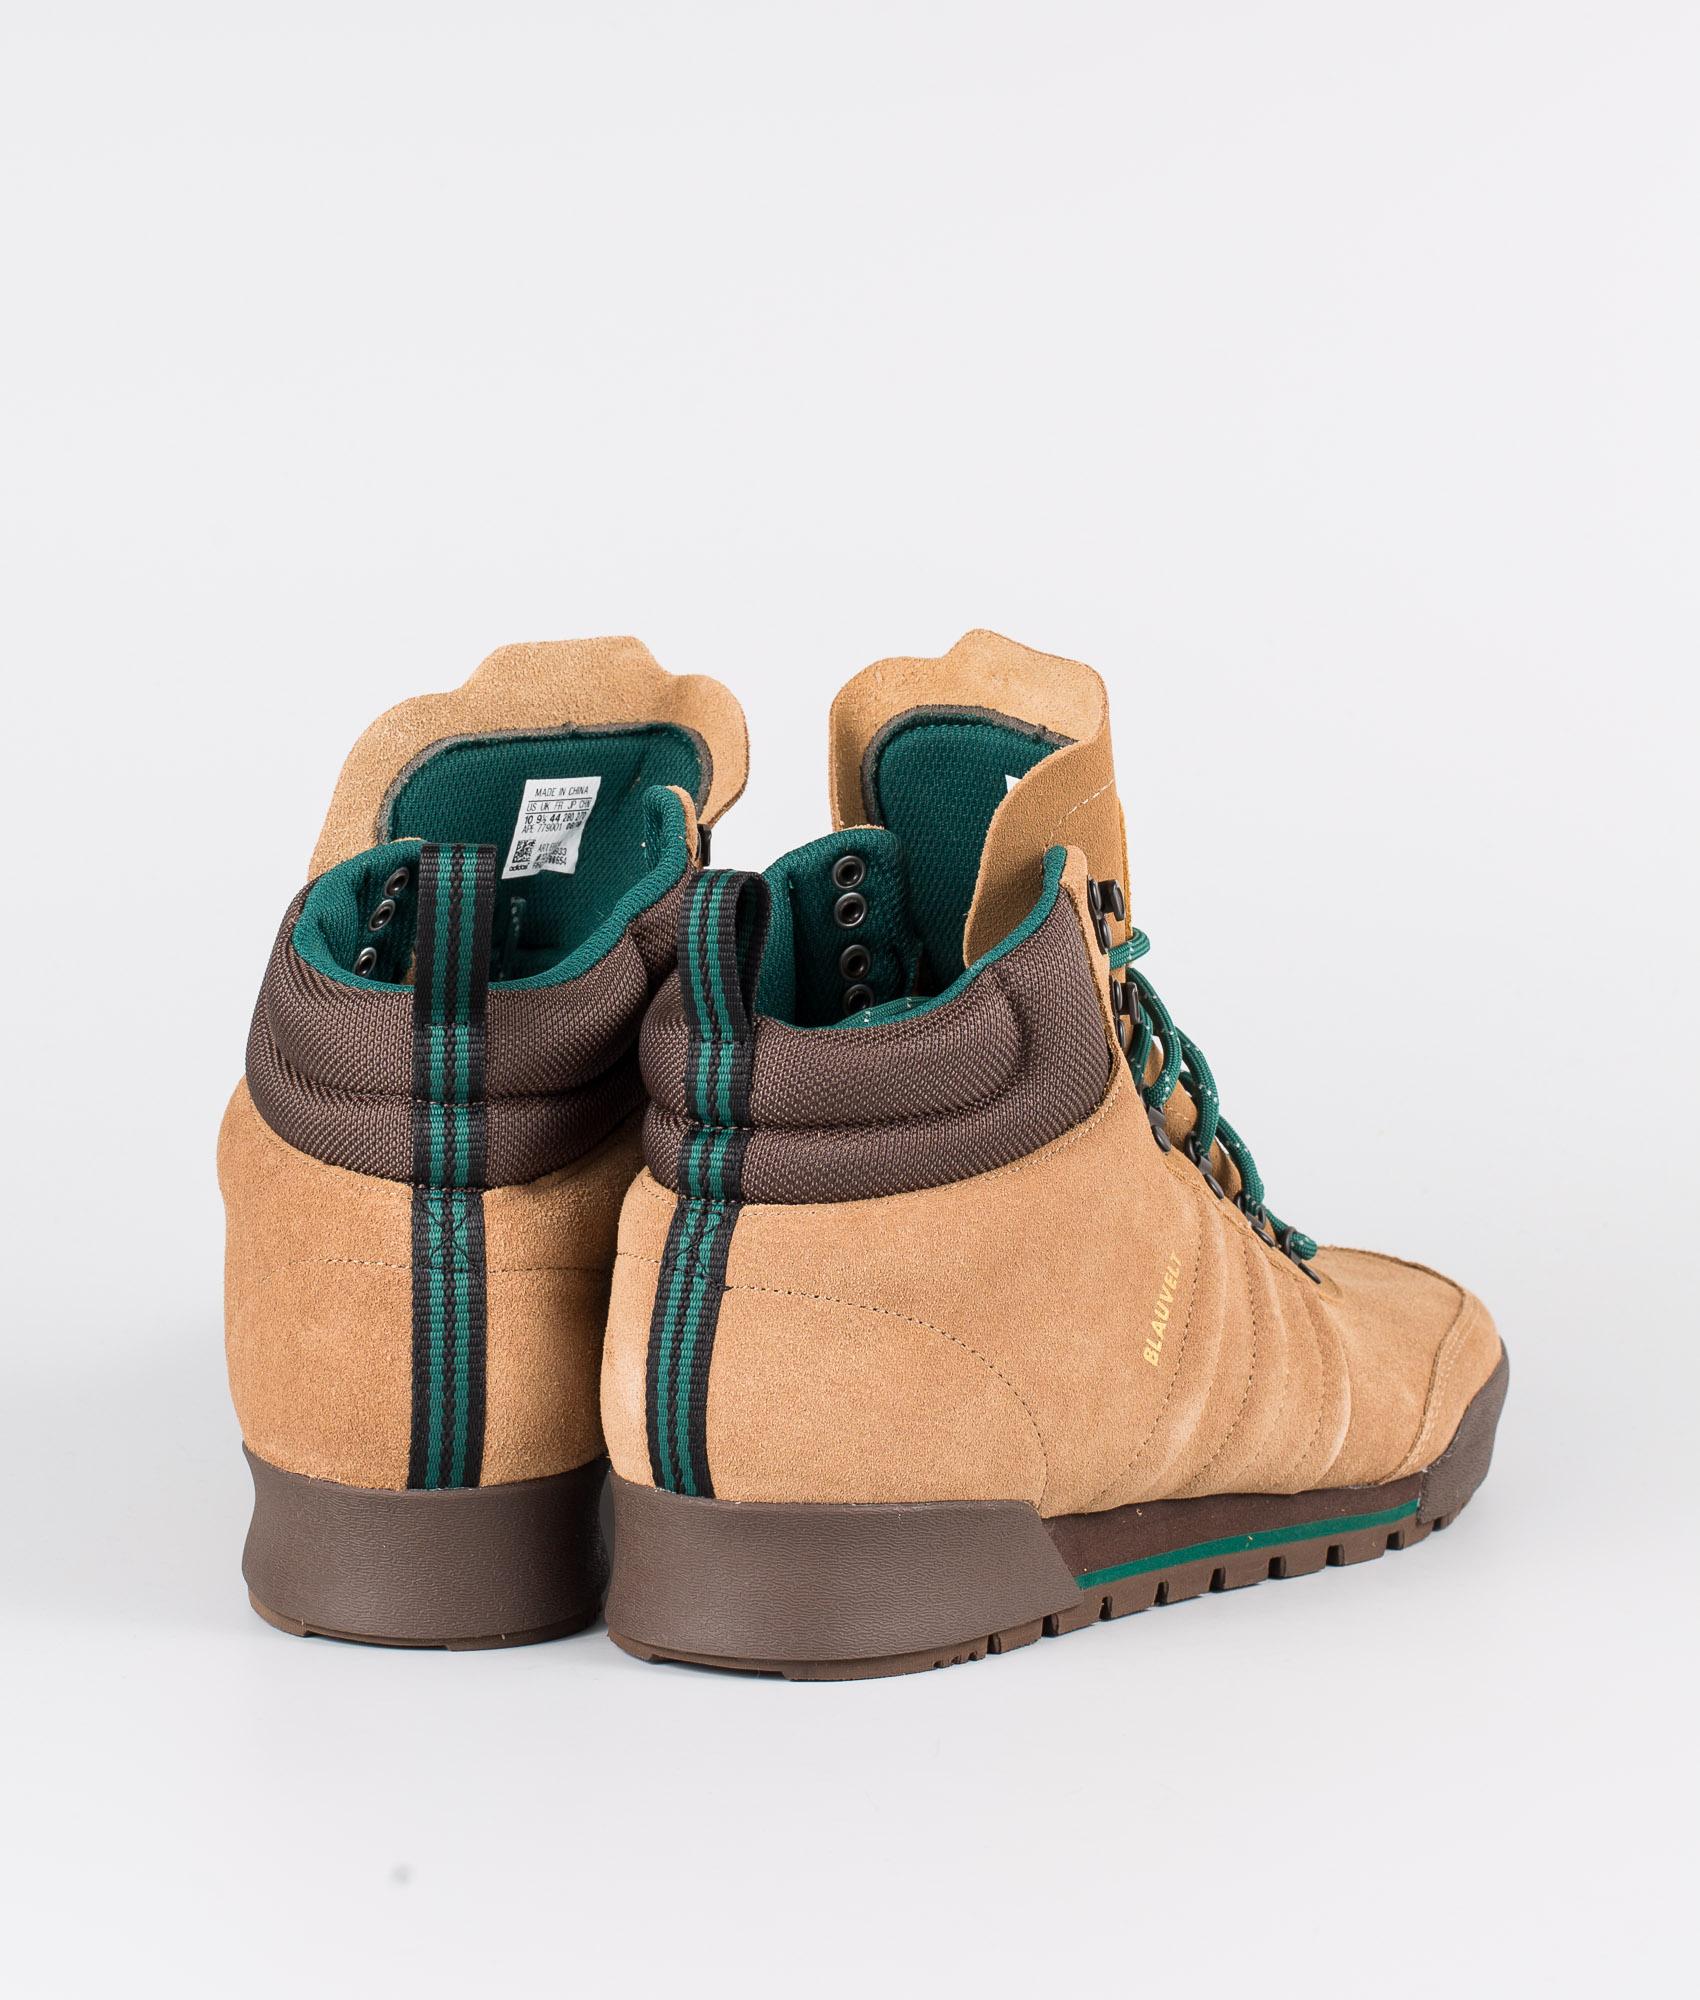 adidas Skateboarding Jake Boot 2.0 raw desert brown collegiate green